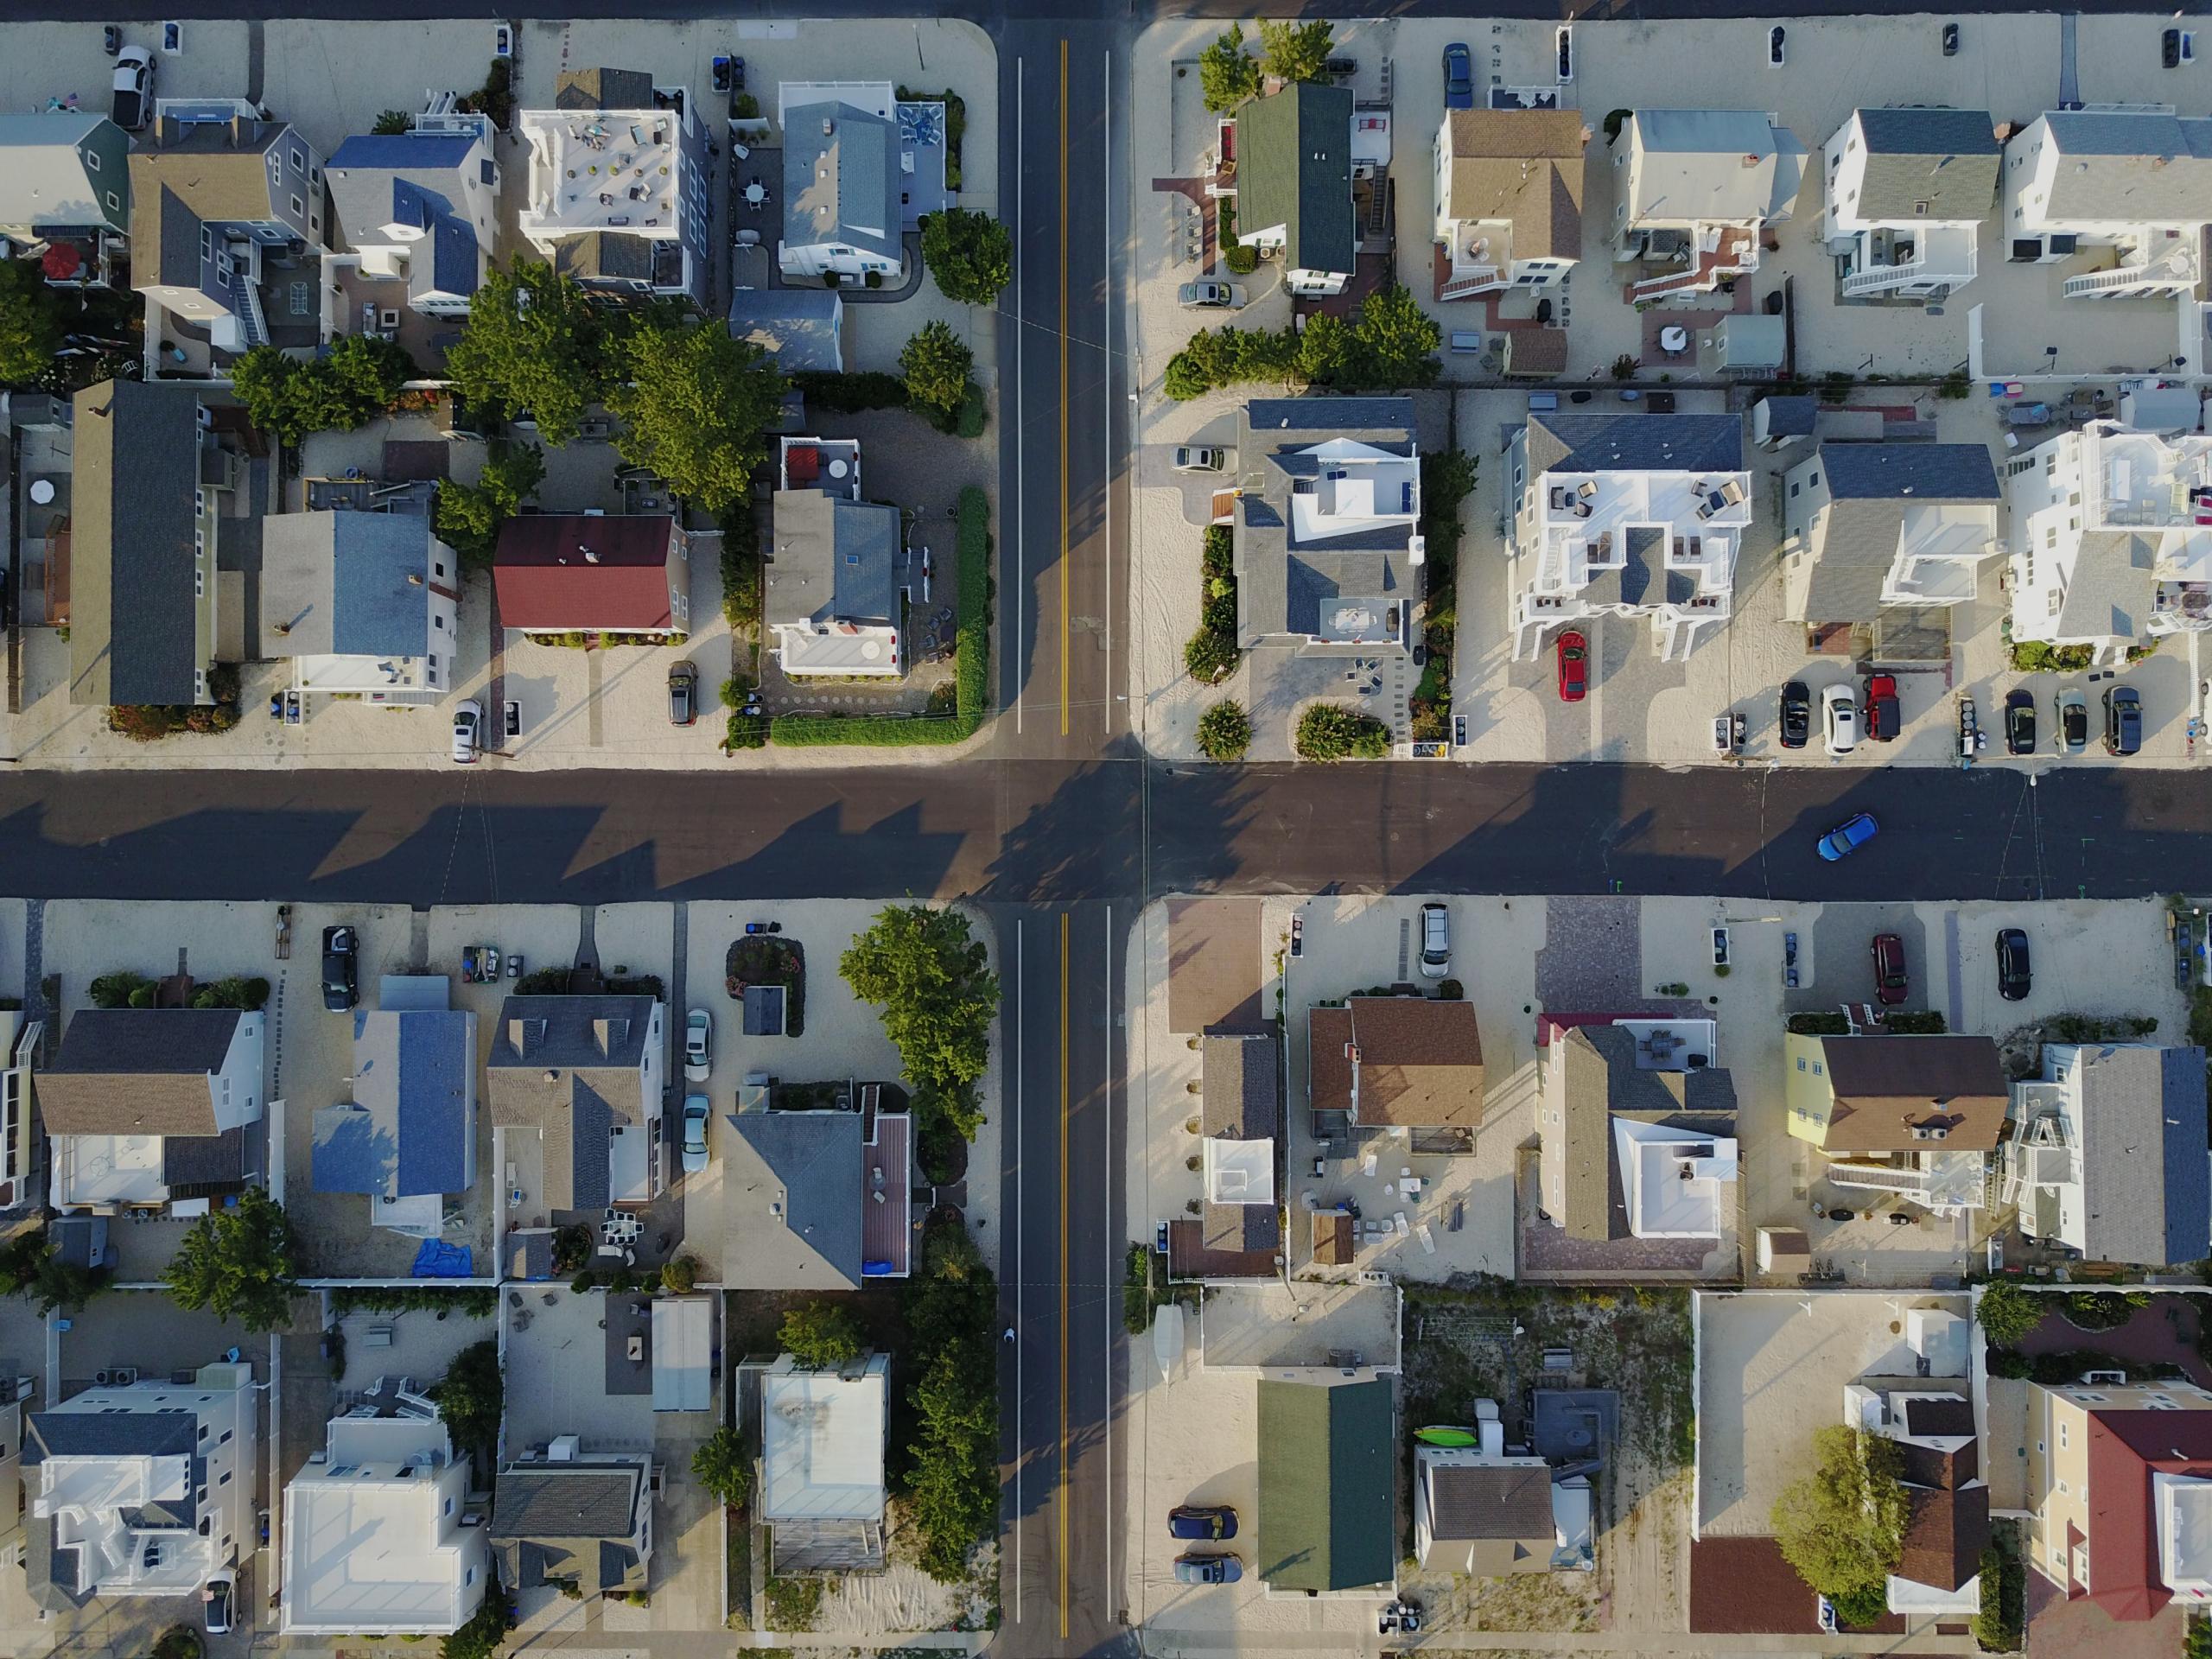 Banyak Diminati Oleh Masyarakat, Simak Ciri-Ciri Dan Keunggulan Rumah Cluster